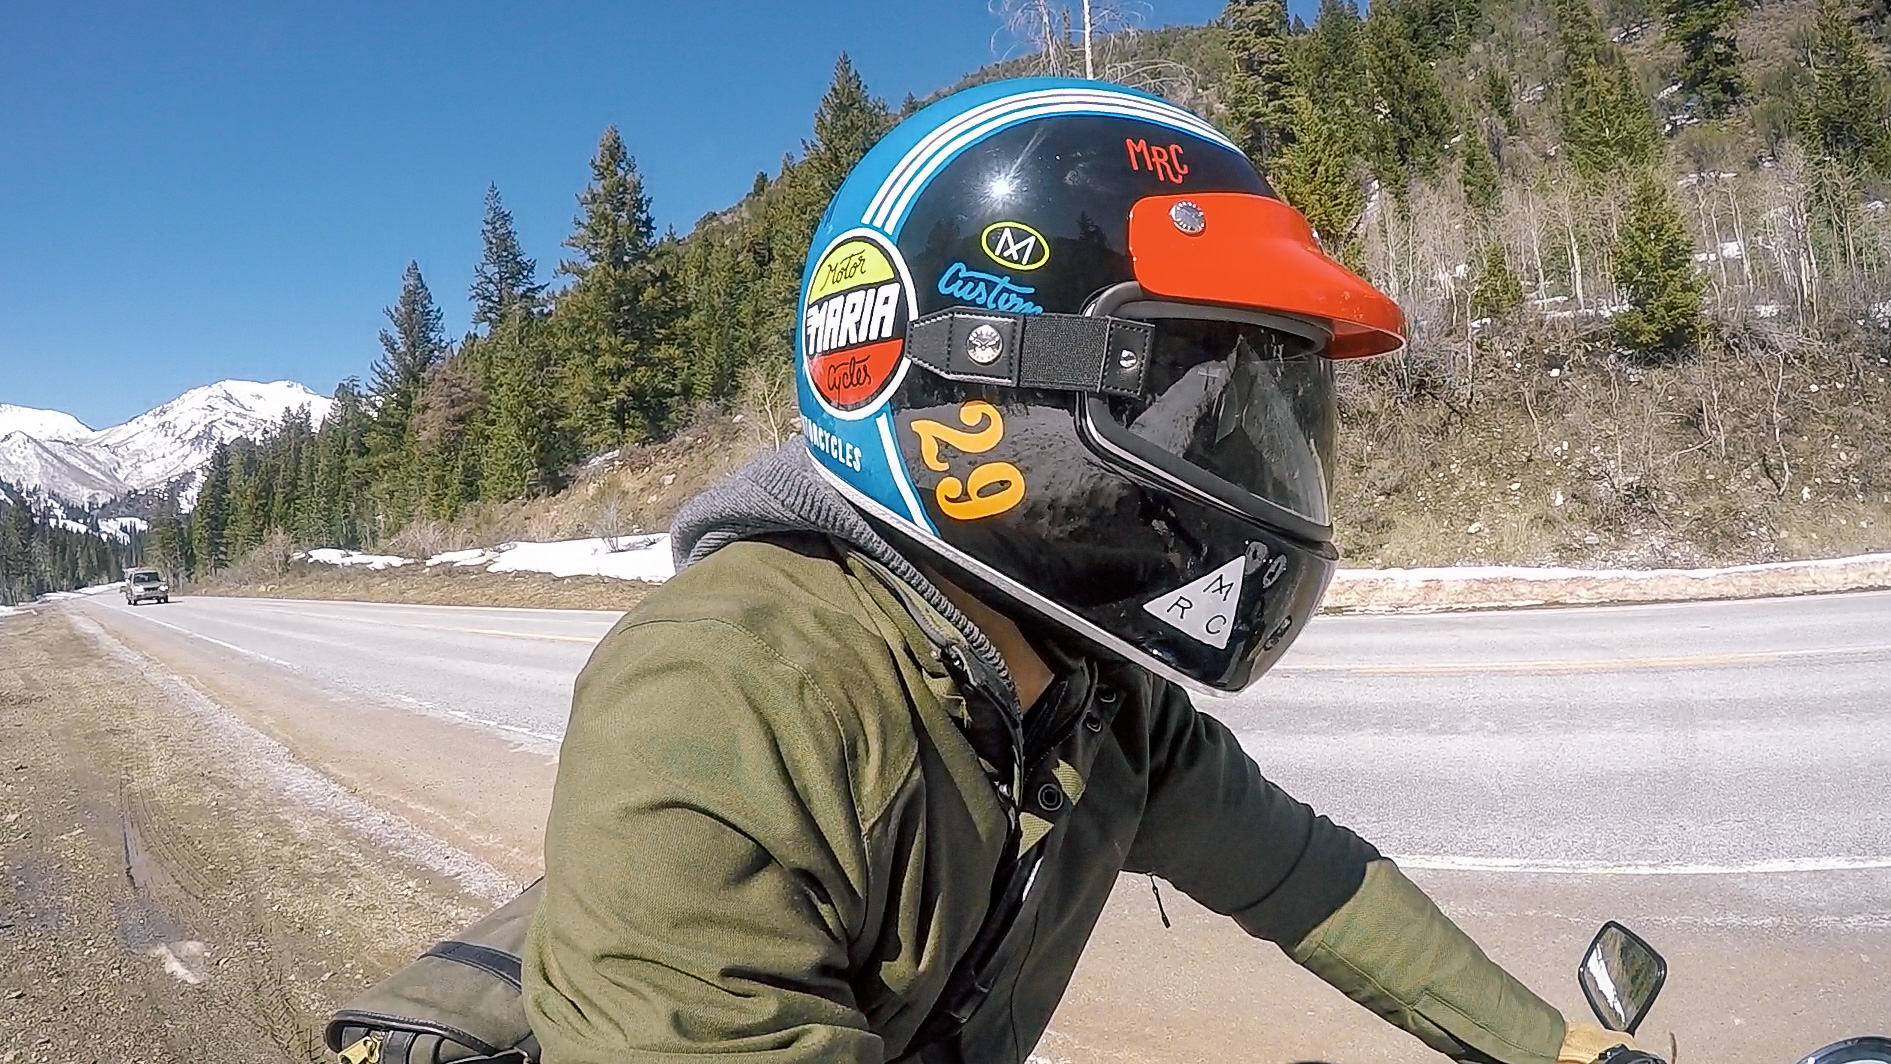 X G 100 Helmet By Nexx Gear Review Sideroist